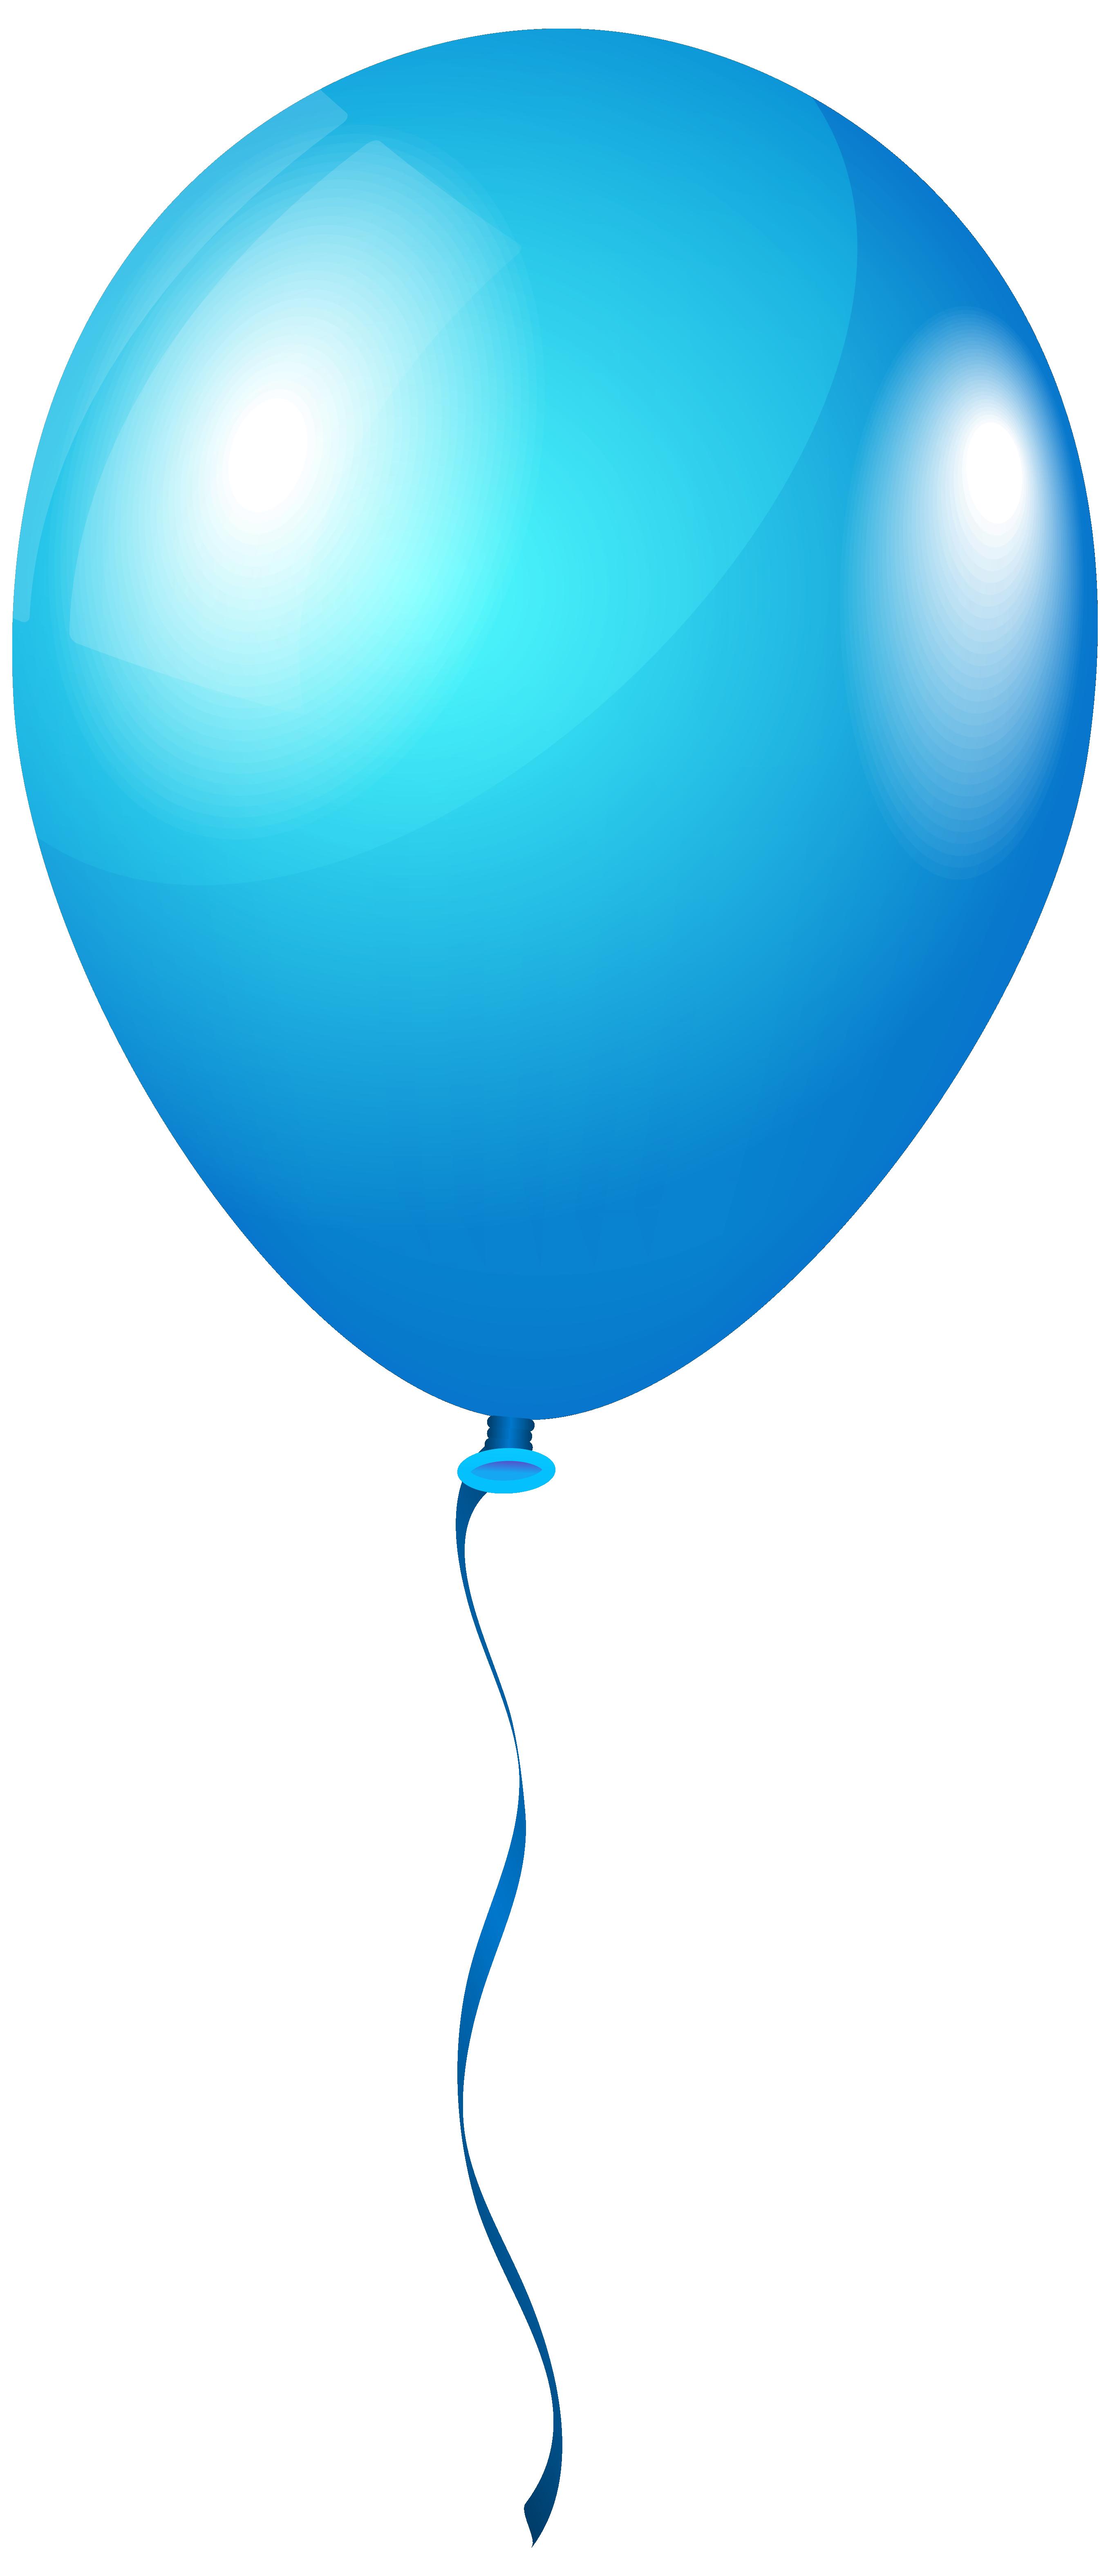 Clipart balloon teal. Single blueballoon png image